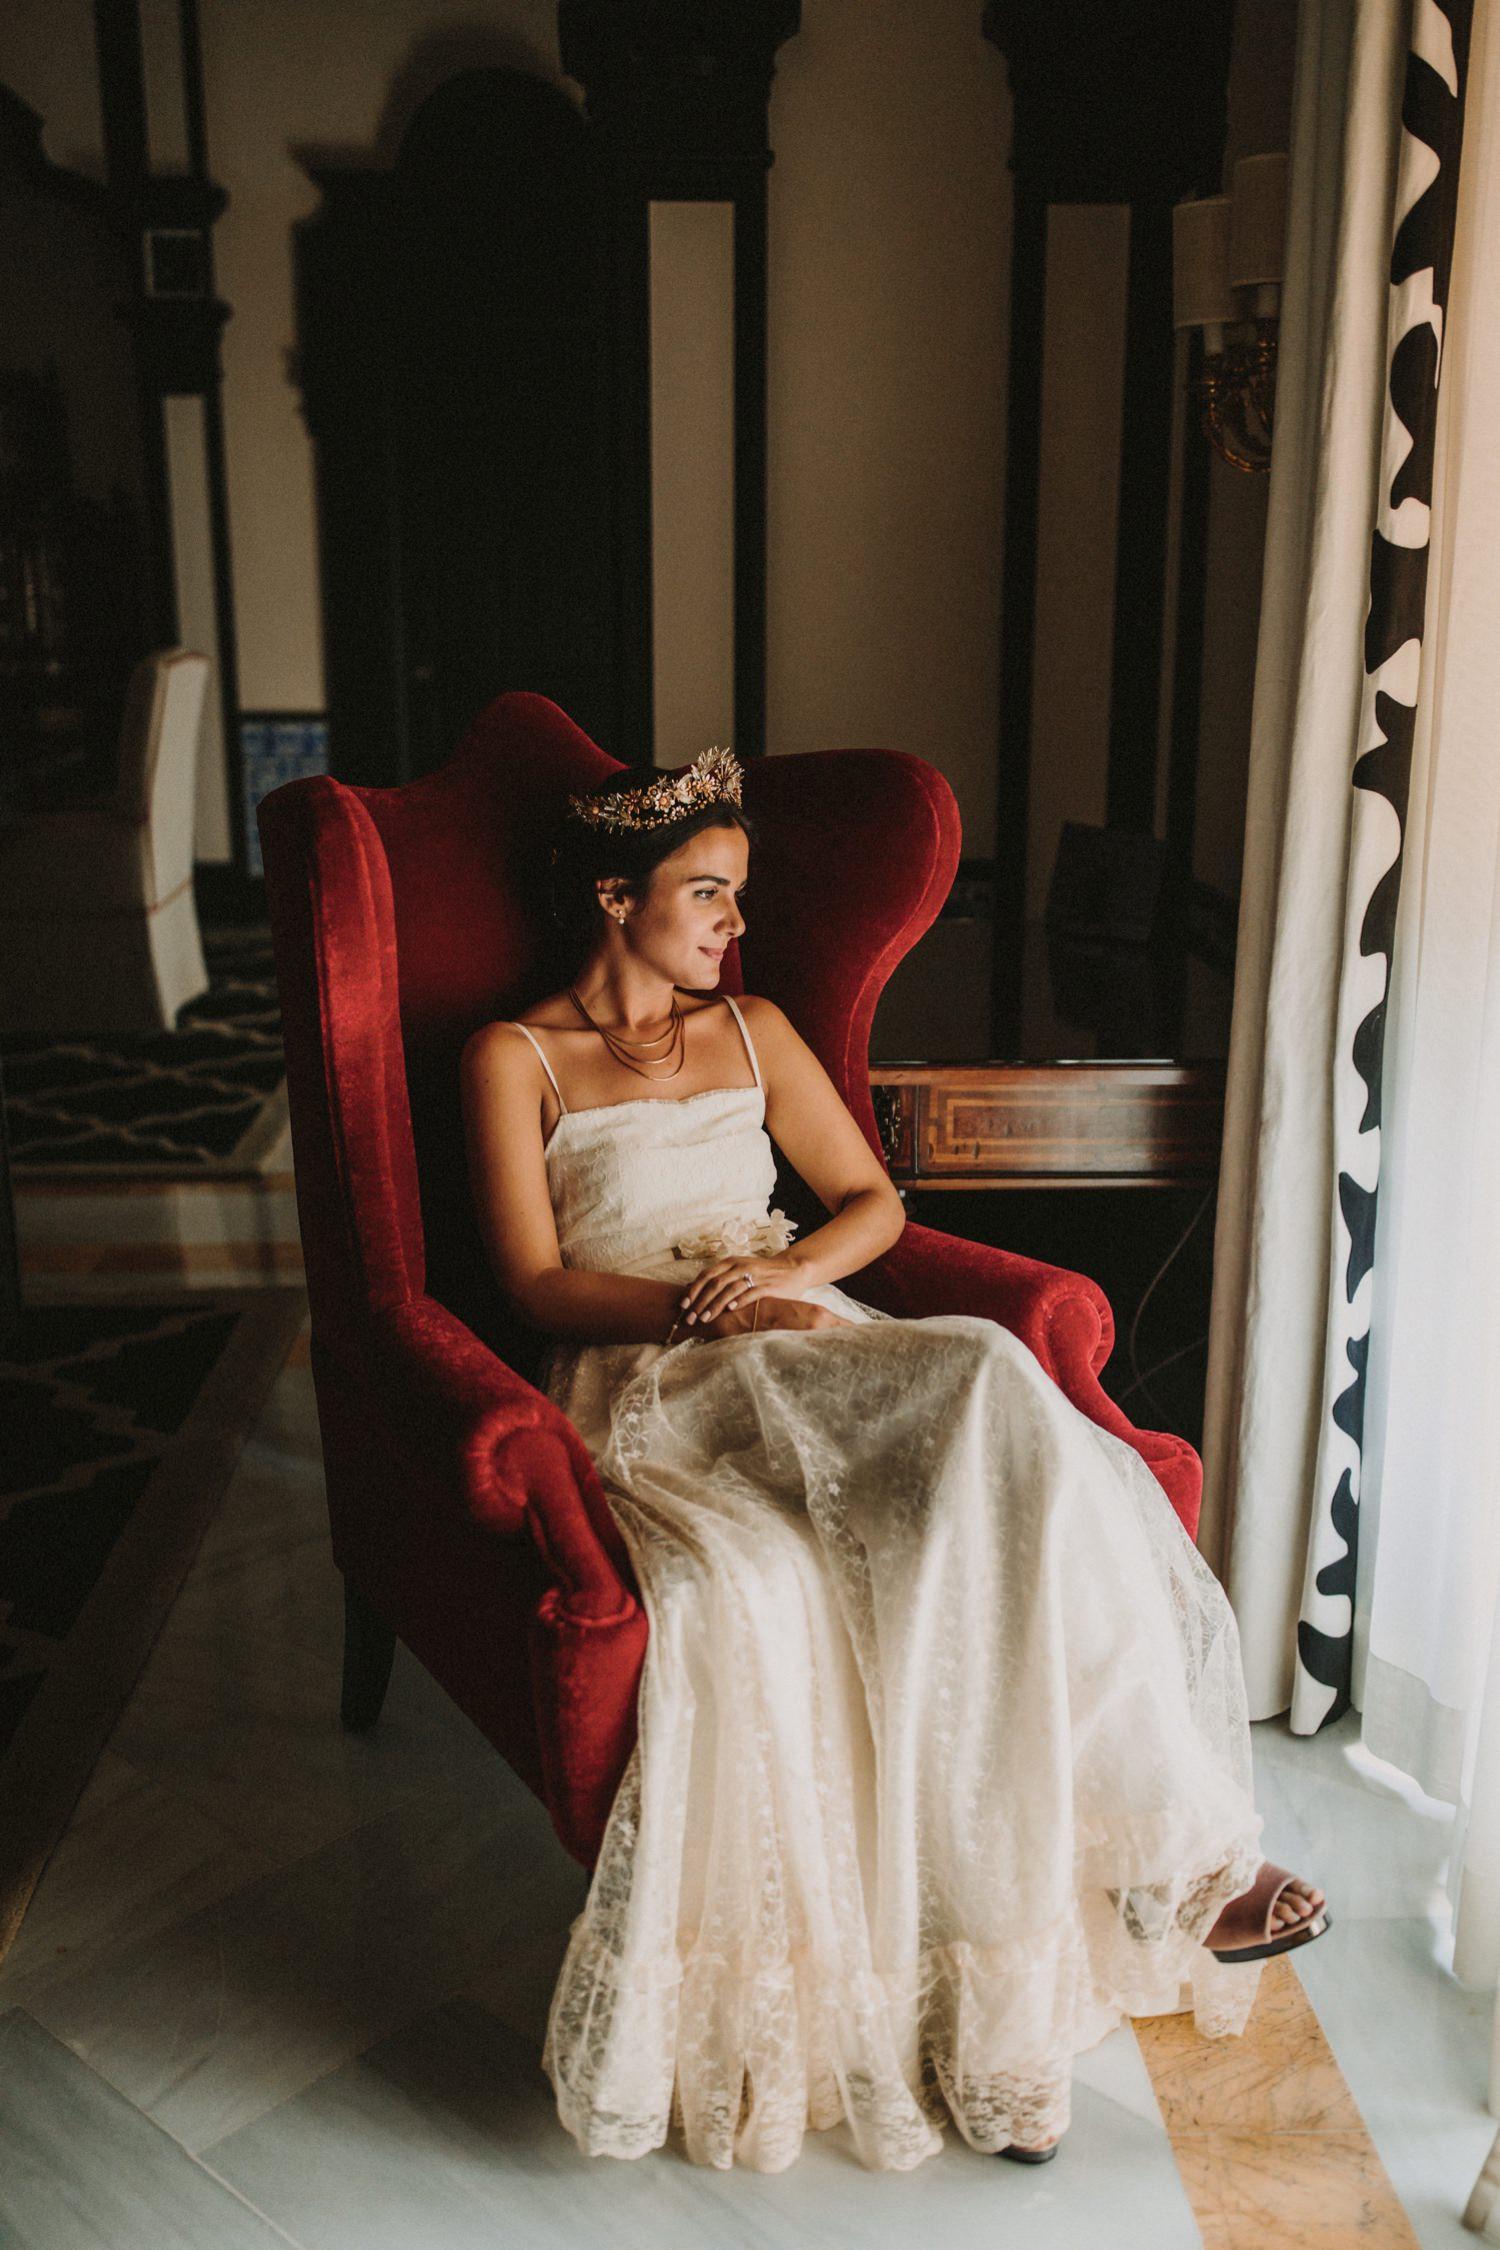 089_wedding-ernestovillalba-maria-daniel-5855-ASE.jpg